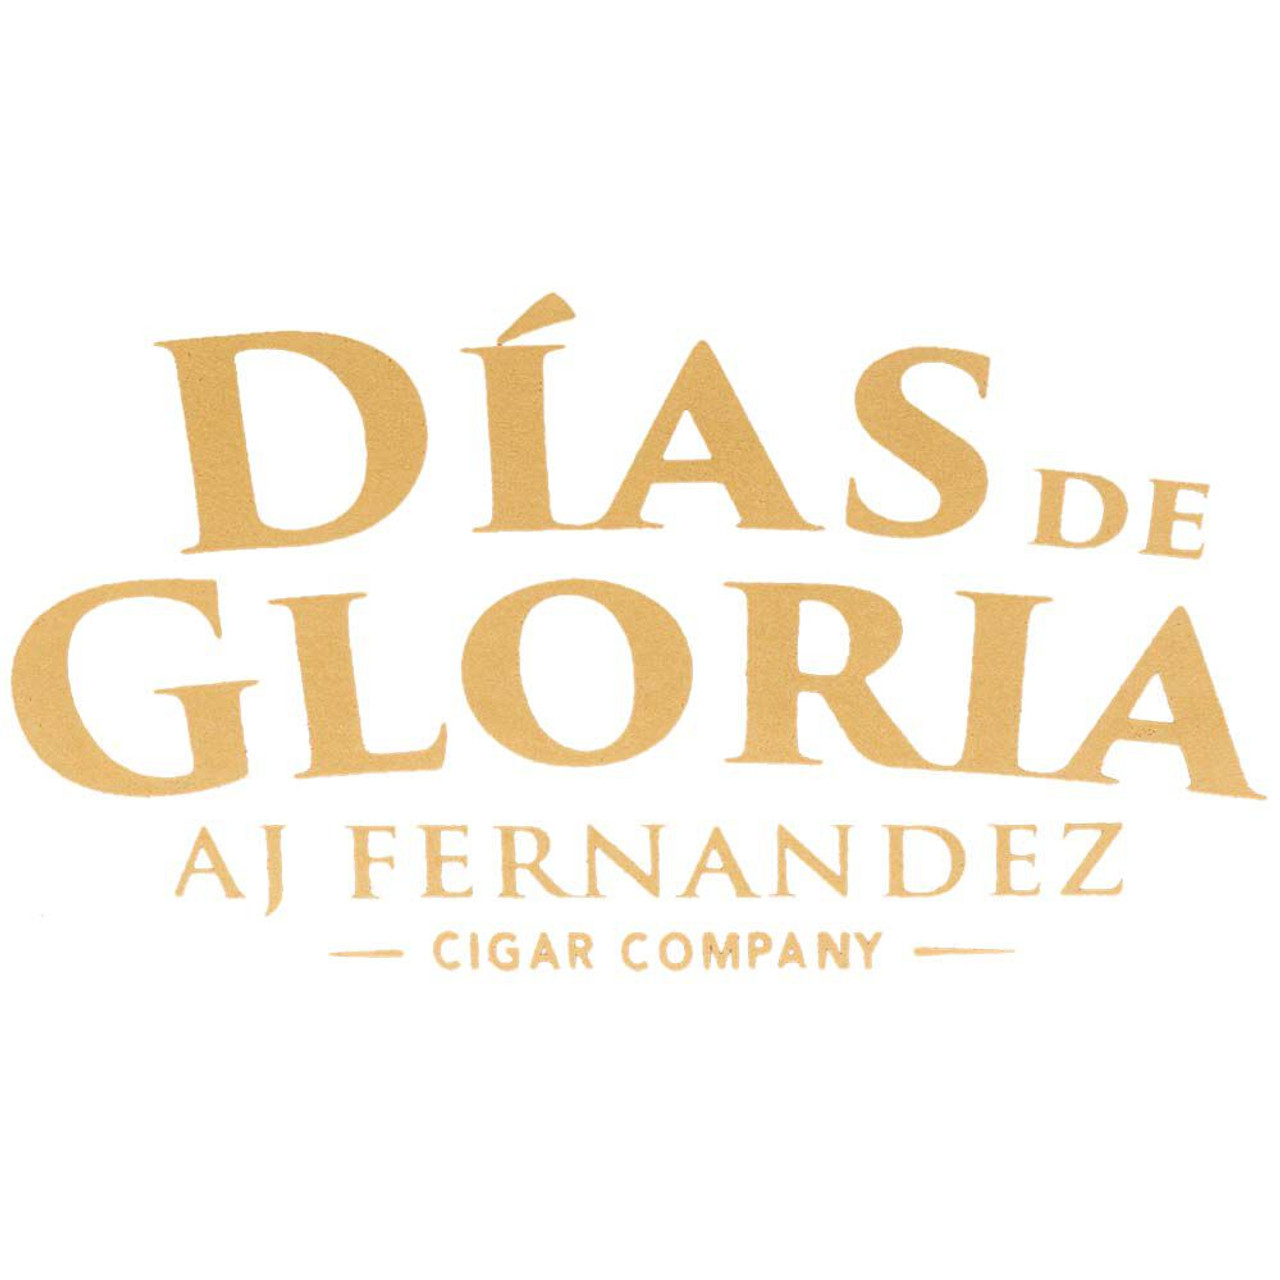 AJ Fernandez Dias de Gloria Robusto Cigars - 5.5 x 52 (Box of 20)